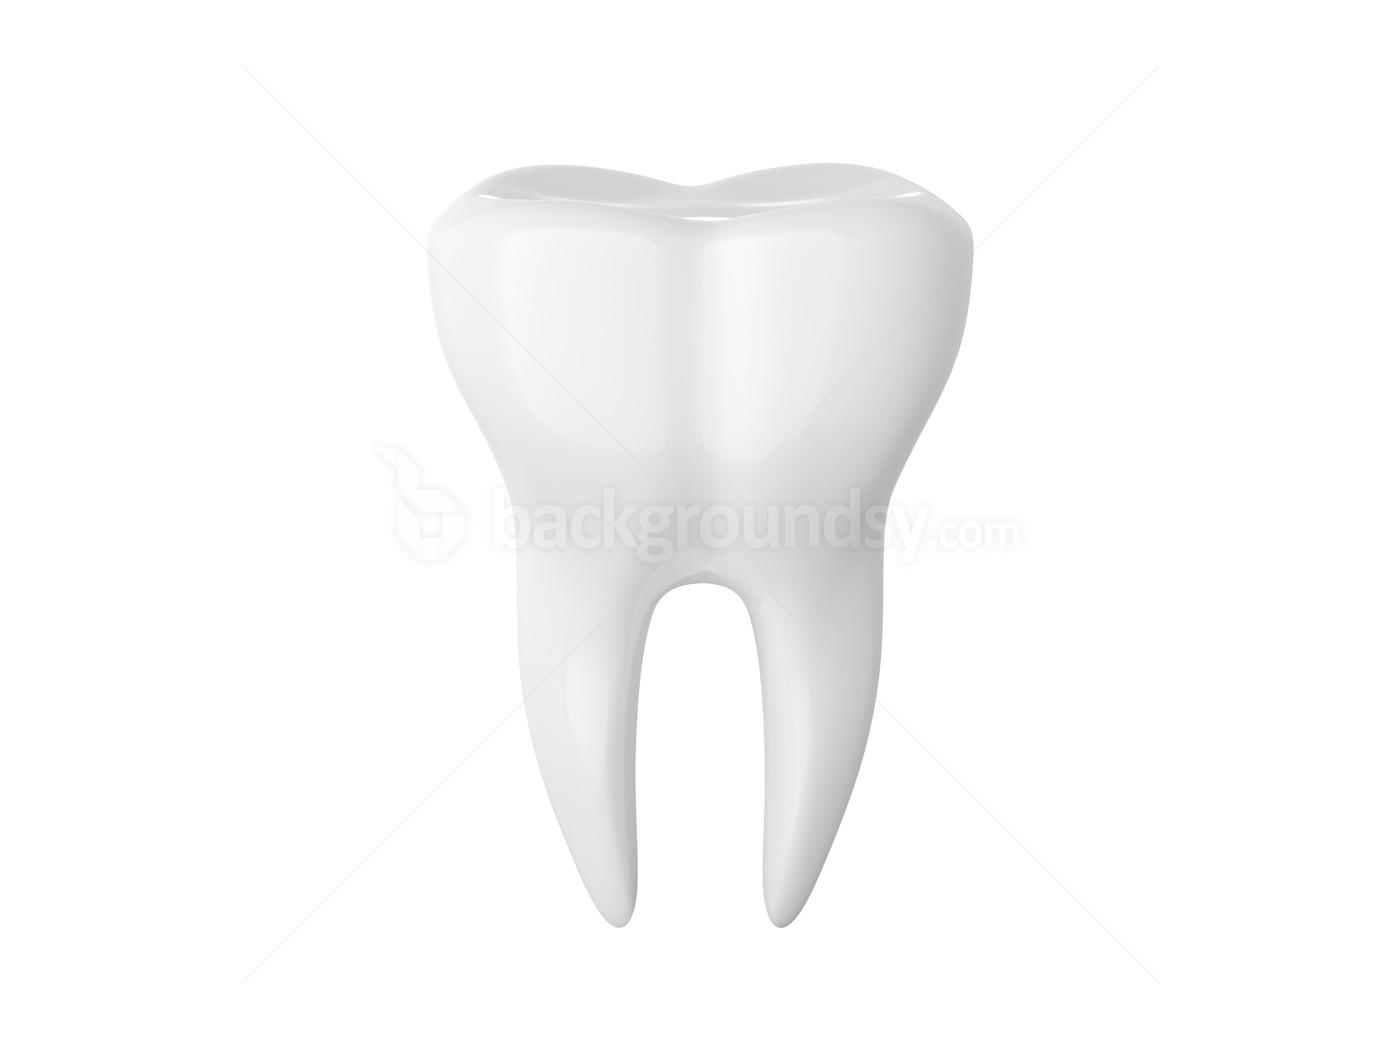 Single dentist dating site